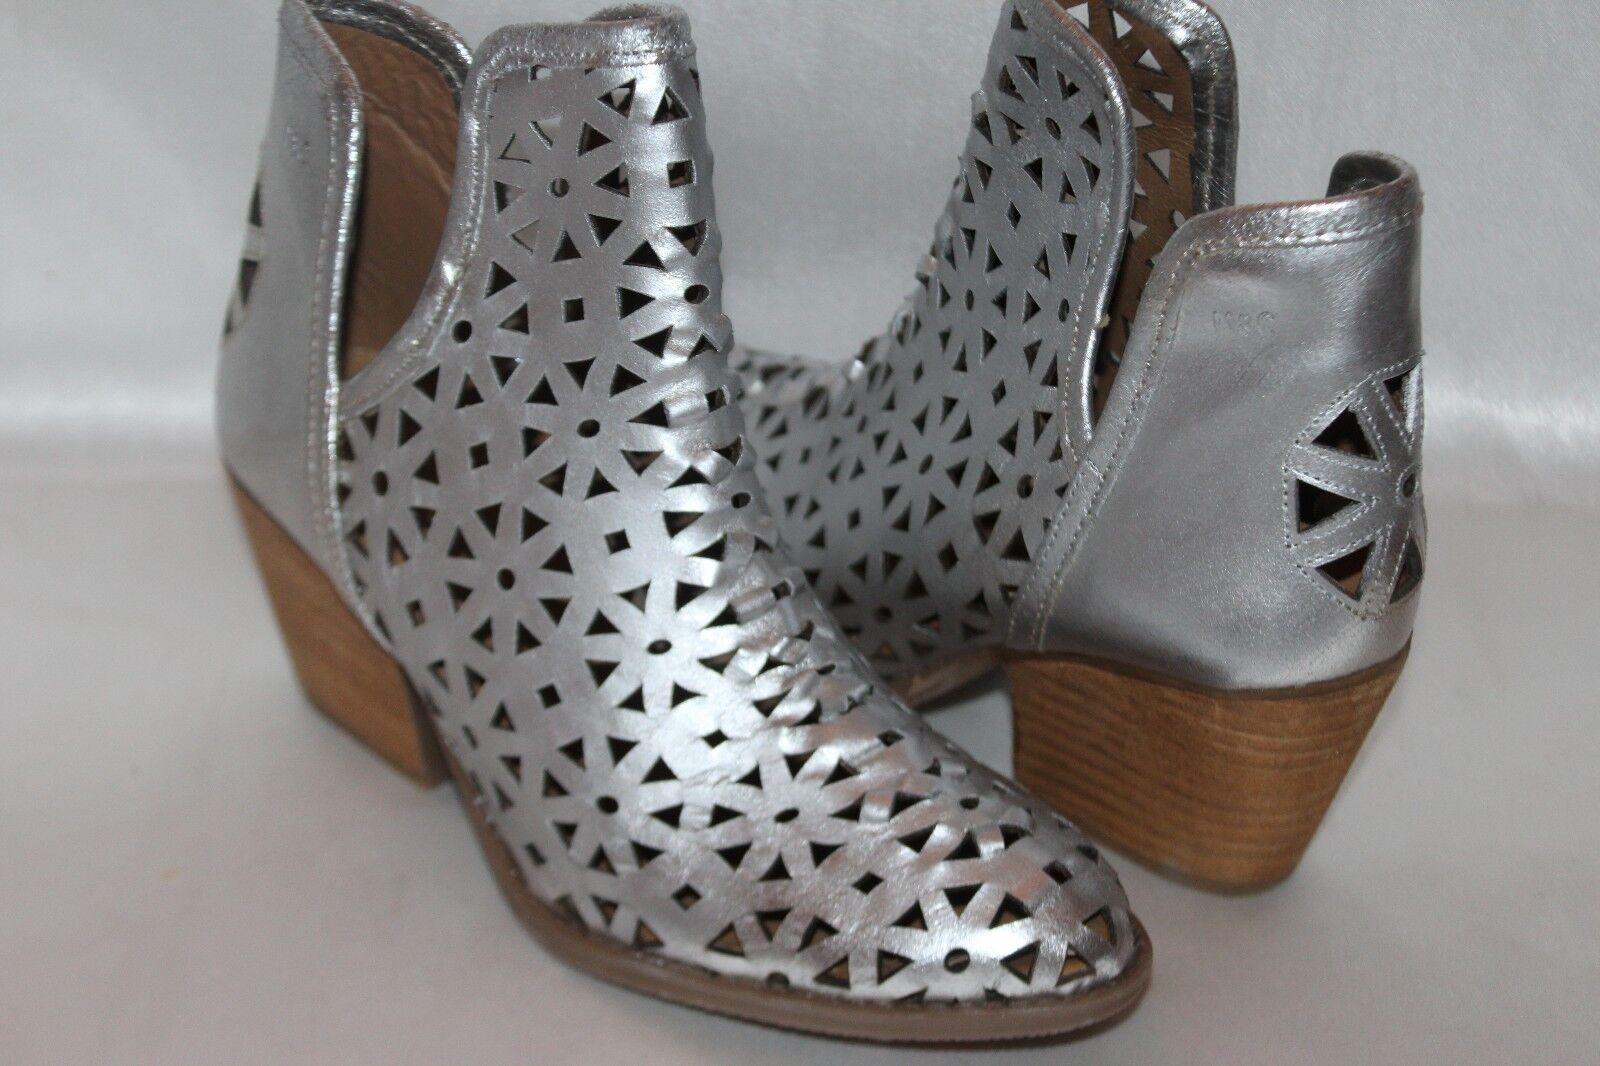 NEW! MUSSE & CLOUD Metallic Silver Cutout Leather ATHENA Ankle Boots Sz 9 EU40